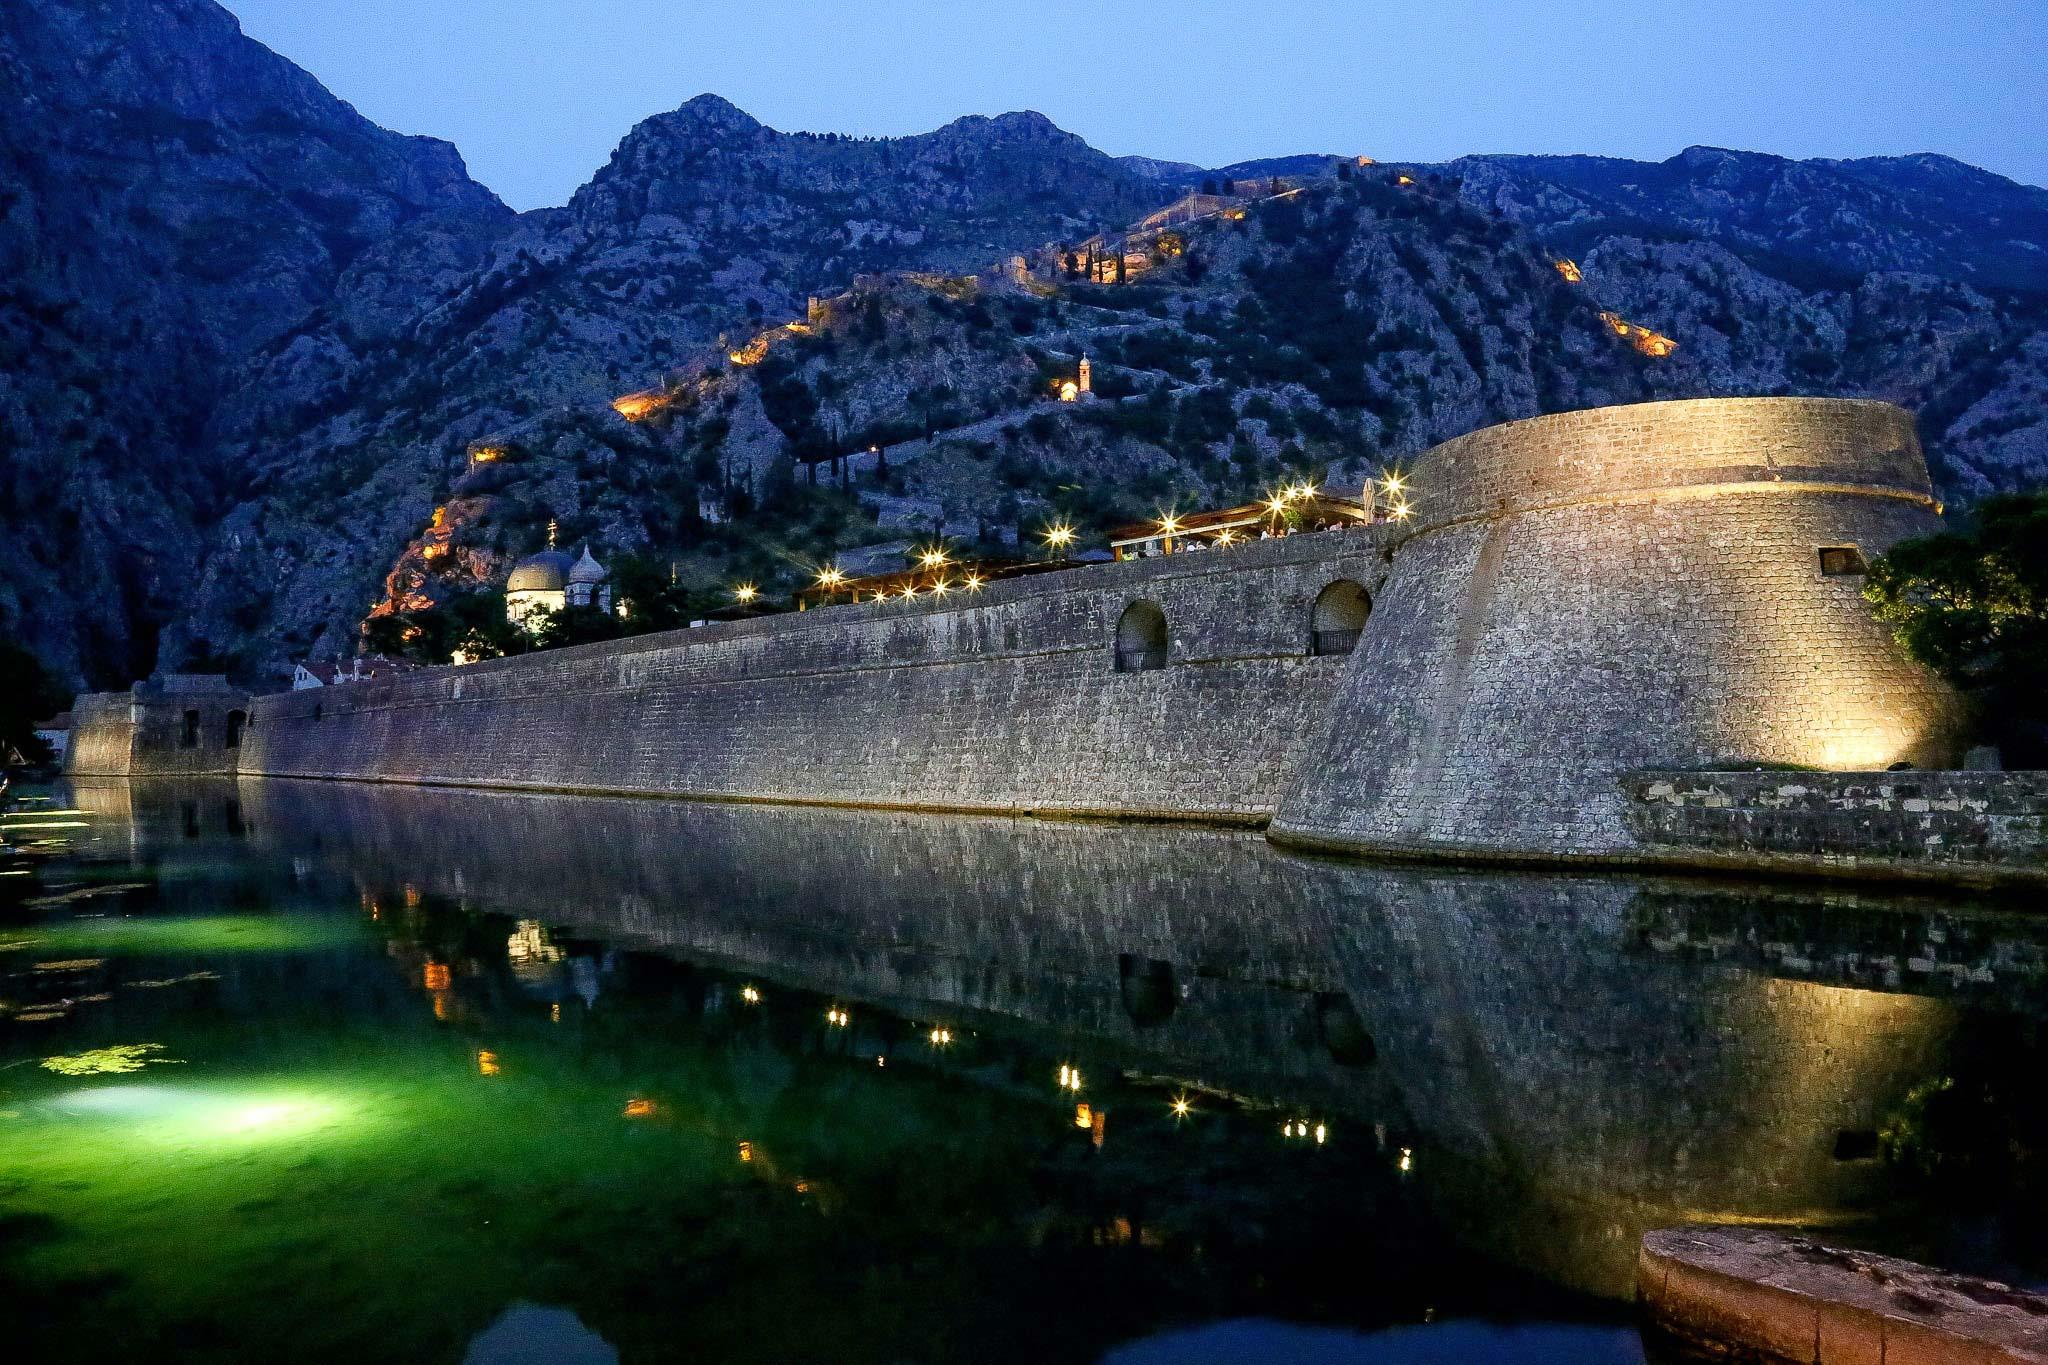 fortification architecture, srpska arhitektura, fortifikaciona arhitektura